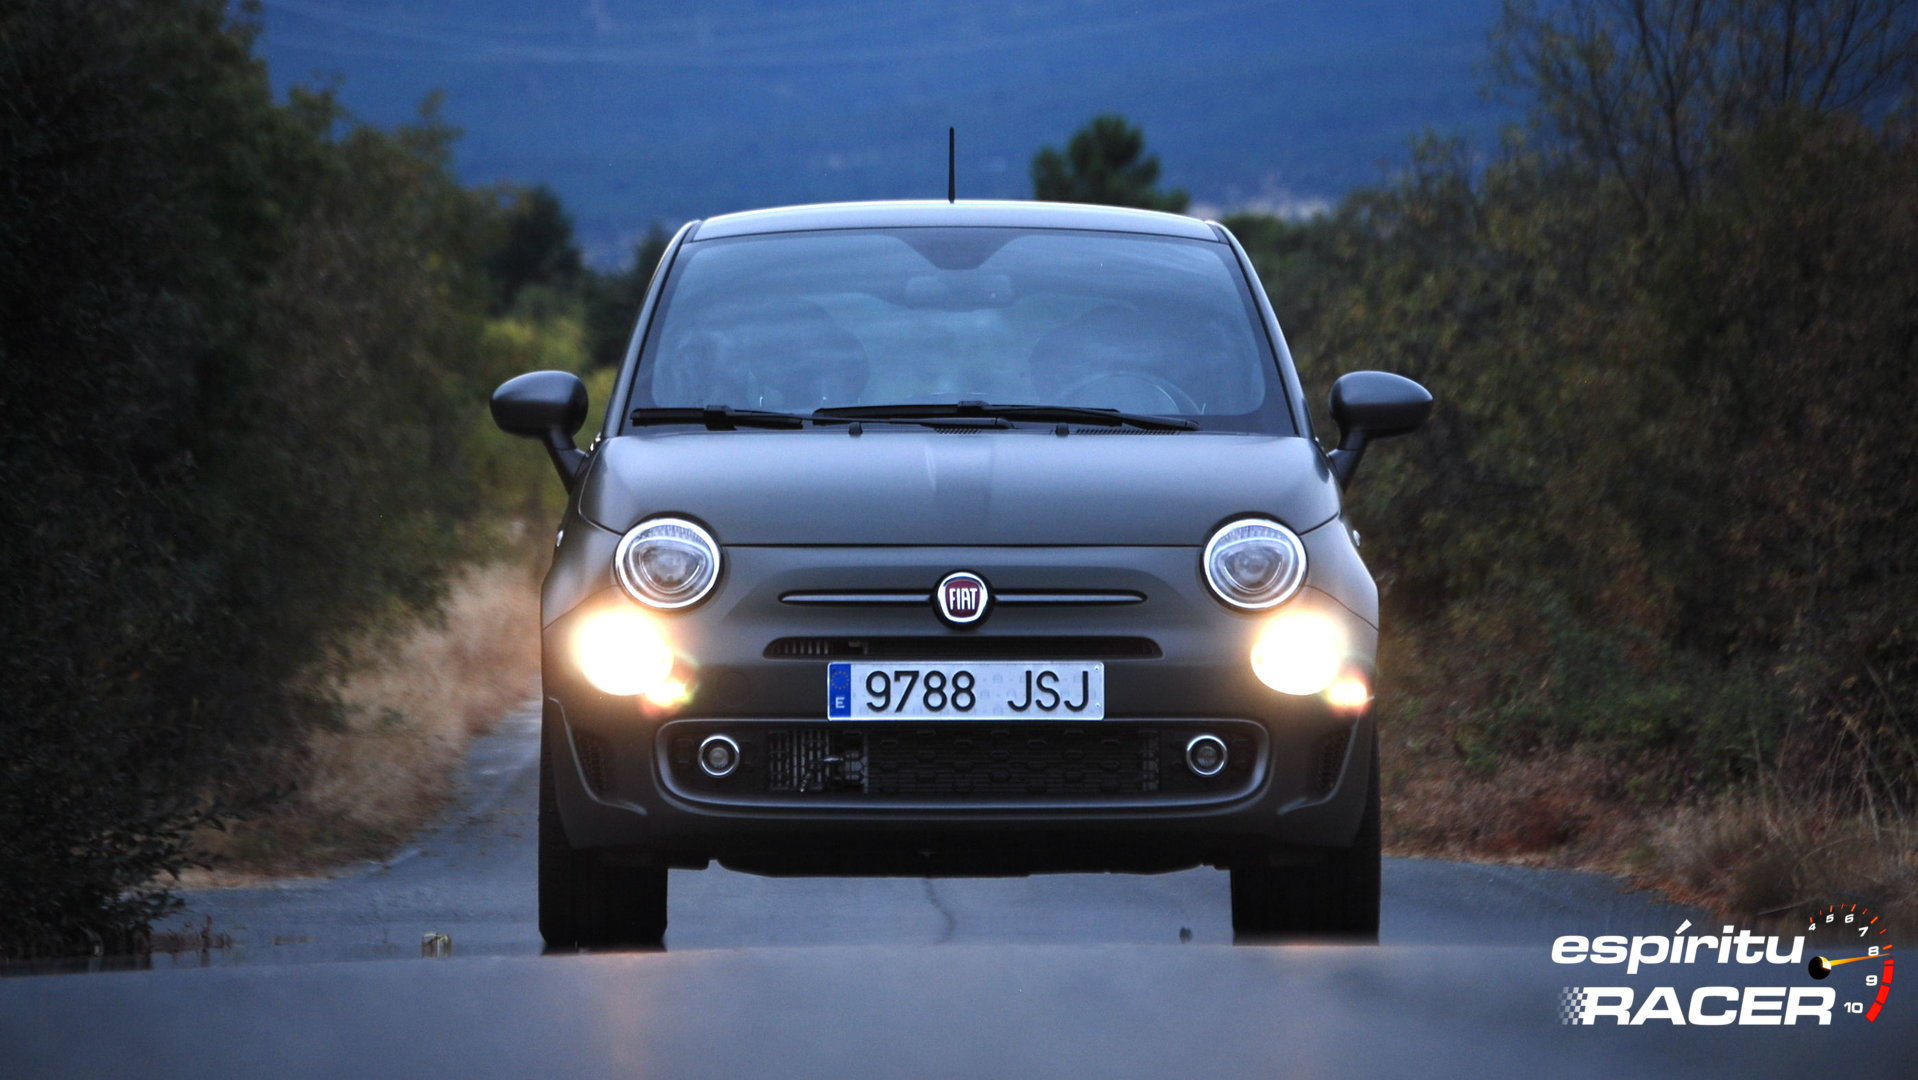 Prueba: Fiat 500 S 1.3 MultiJet